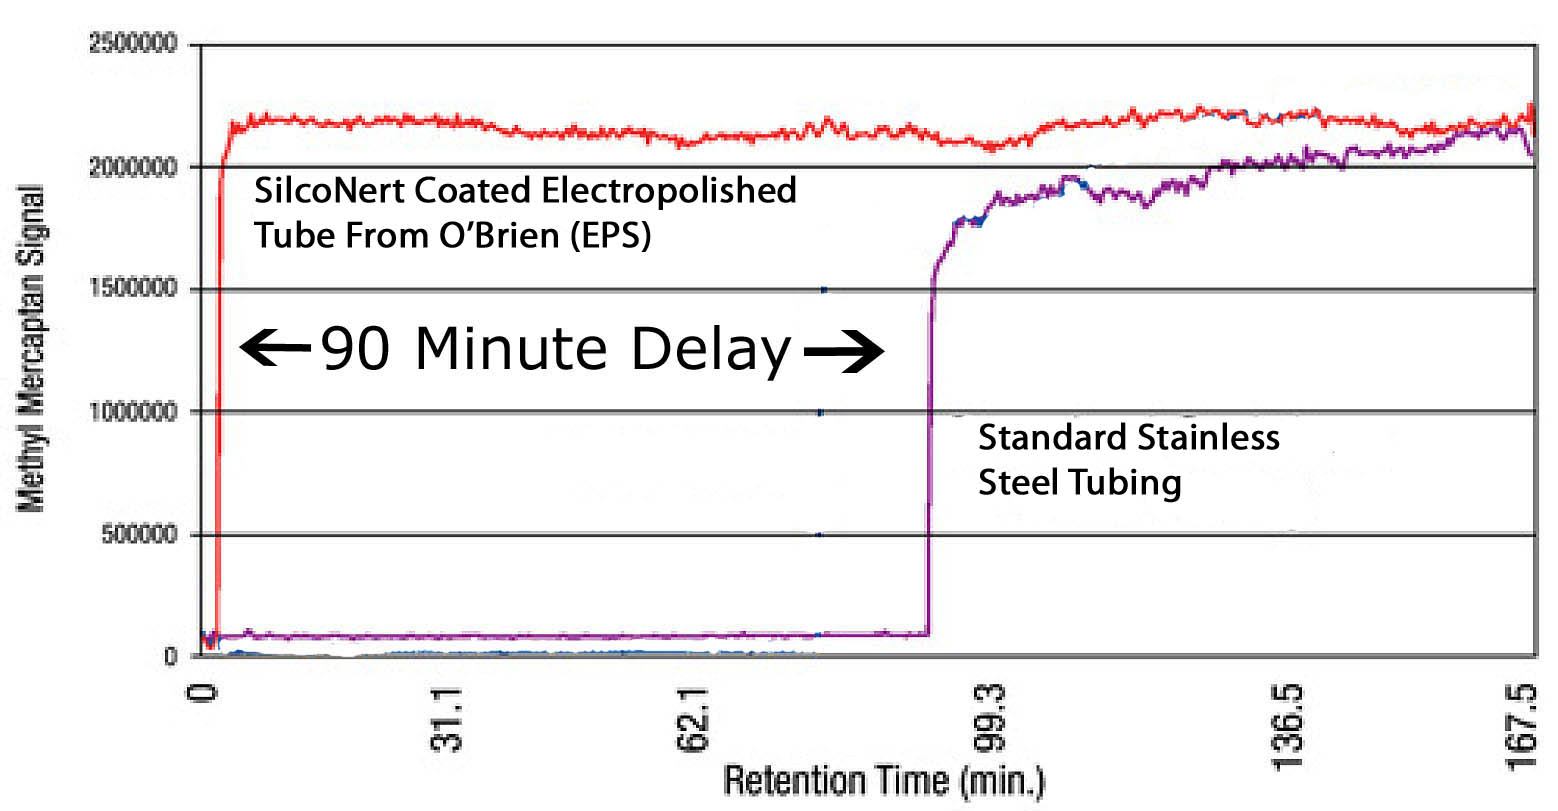 SilcoNert_sulfur_measurement_delay_v210_1_15copy